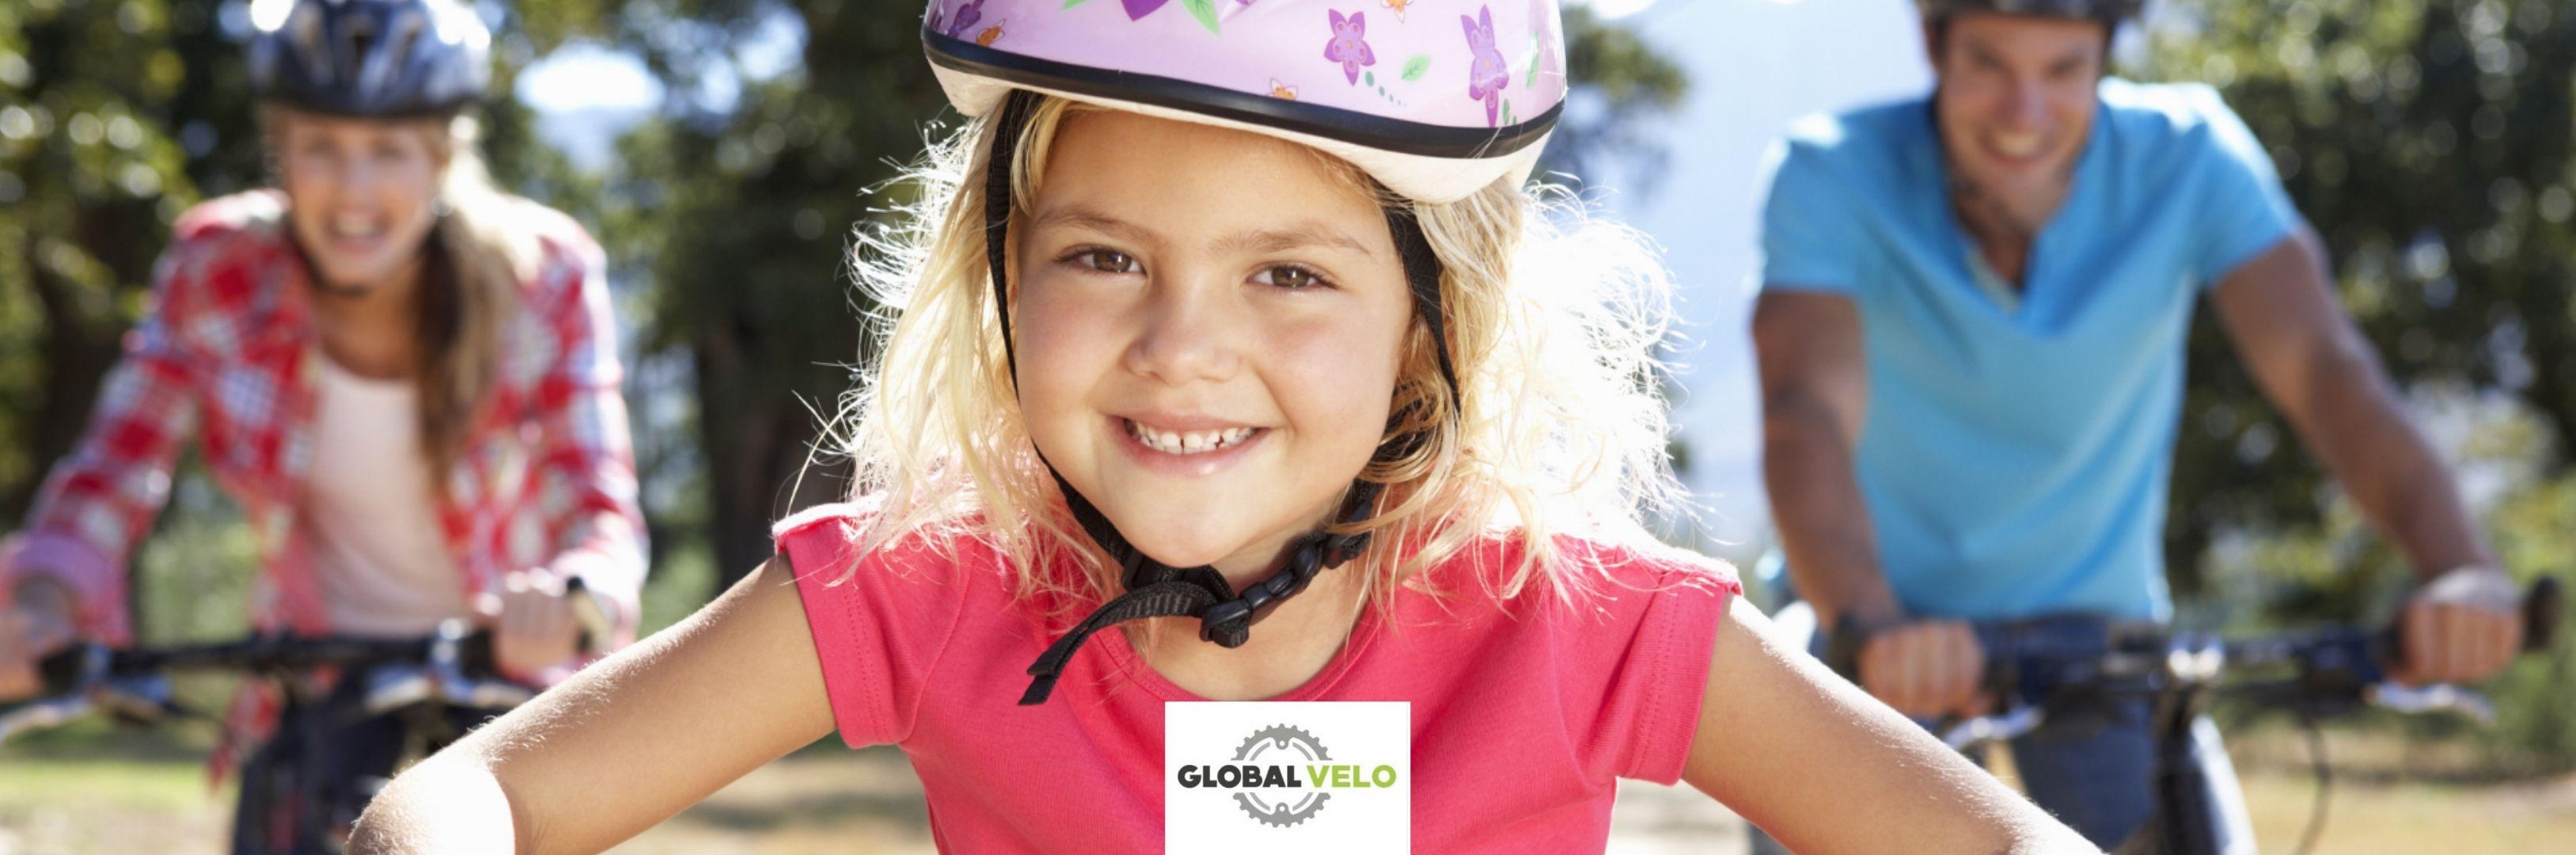 Balade en famille avec vélo enfant